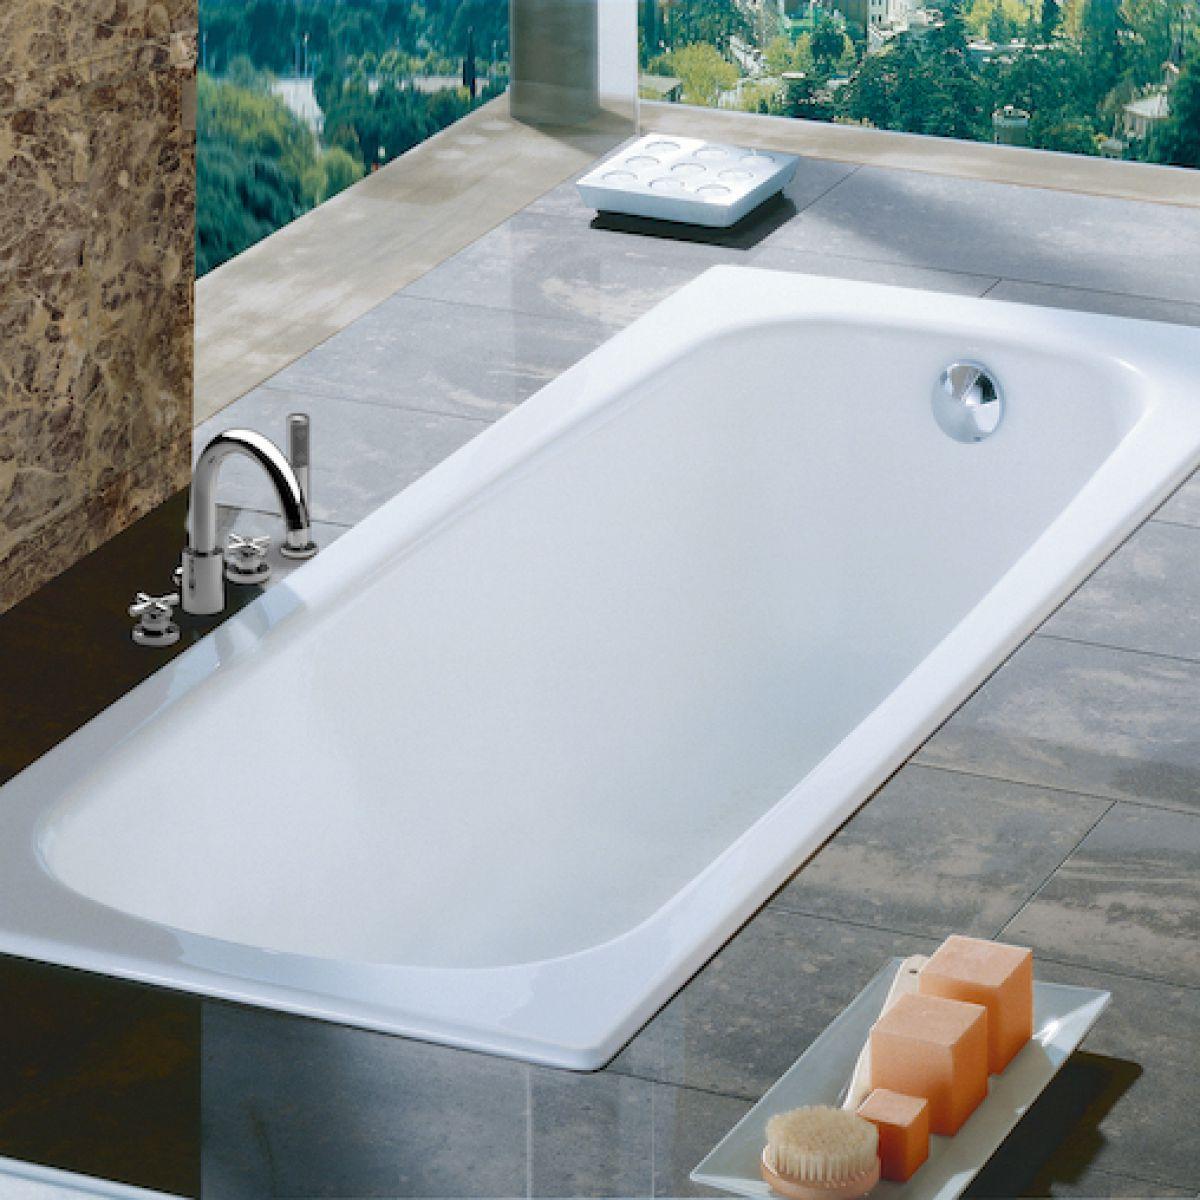 Roca Contesa Standard Steel bath : UK Bathrooms